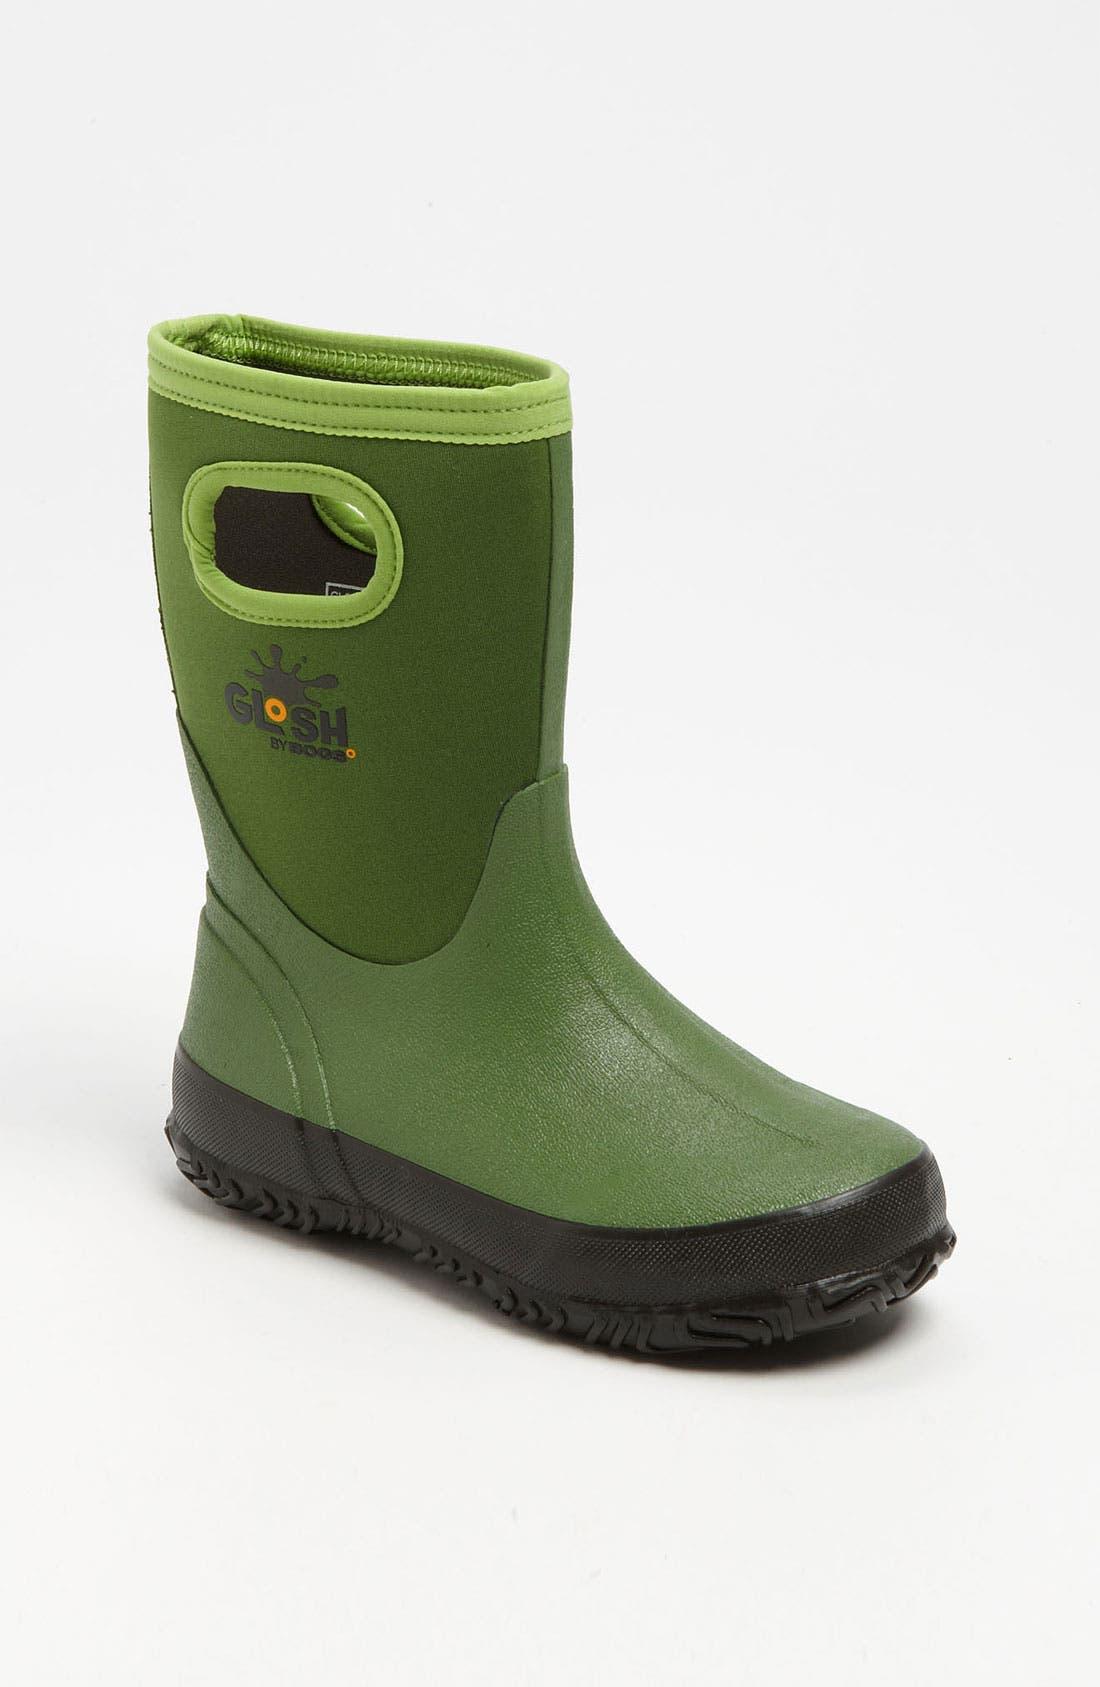 Alternate Image 1 Selected - Bogs 'Glosh' Rain Boot (Toddler, Little Kid & Big Kid)